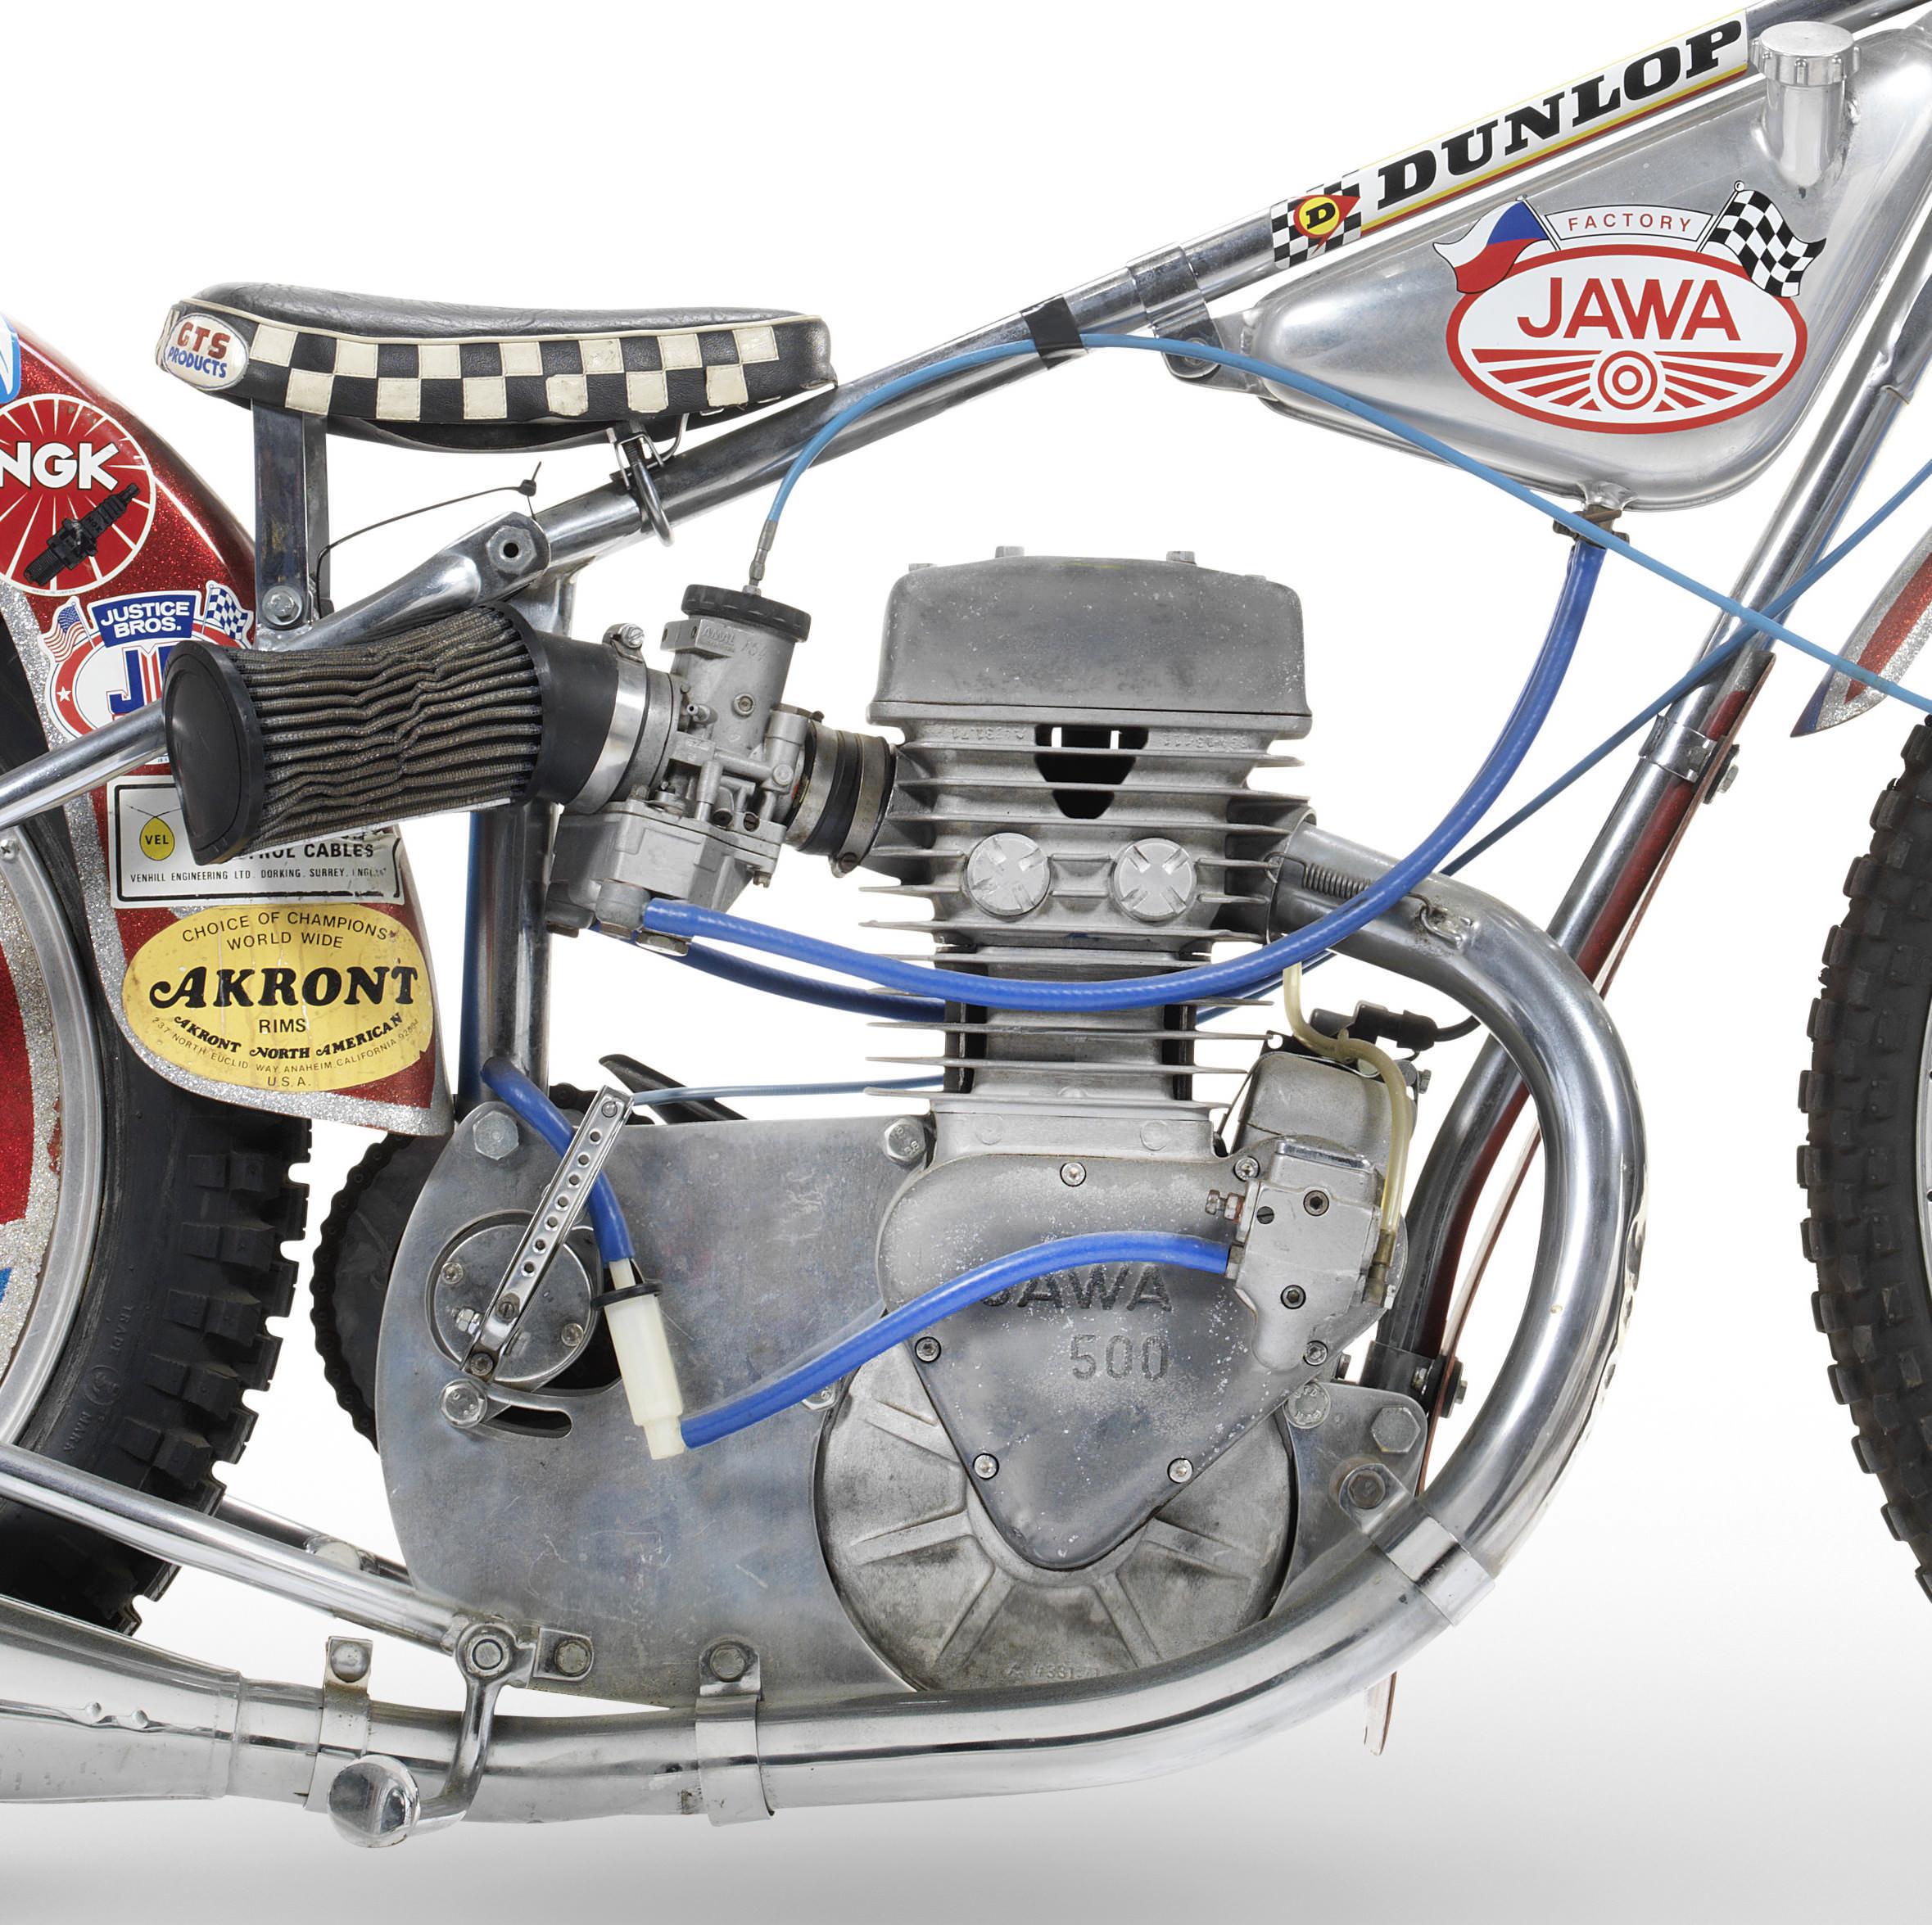 1977 Speedway World Championship Final Winning Jawa Racer